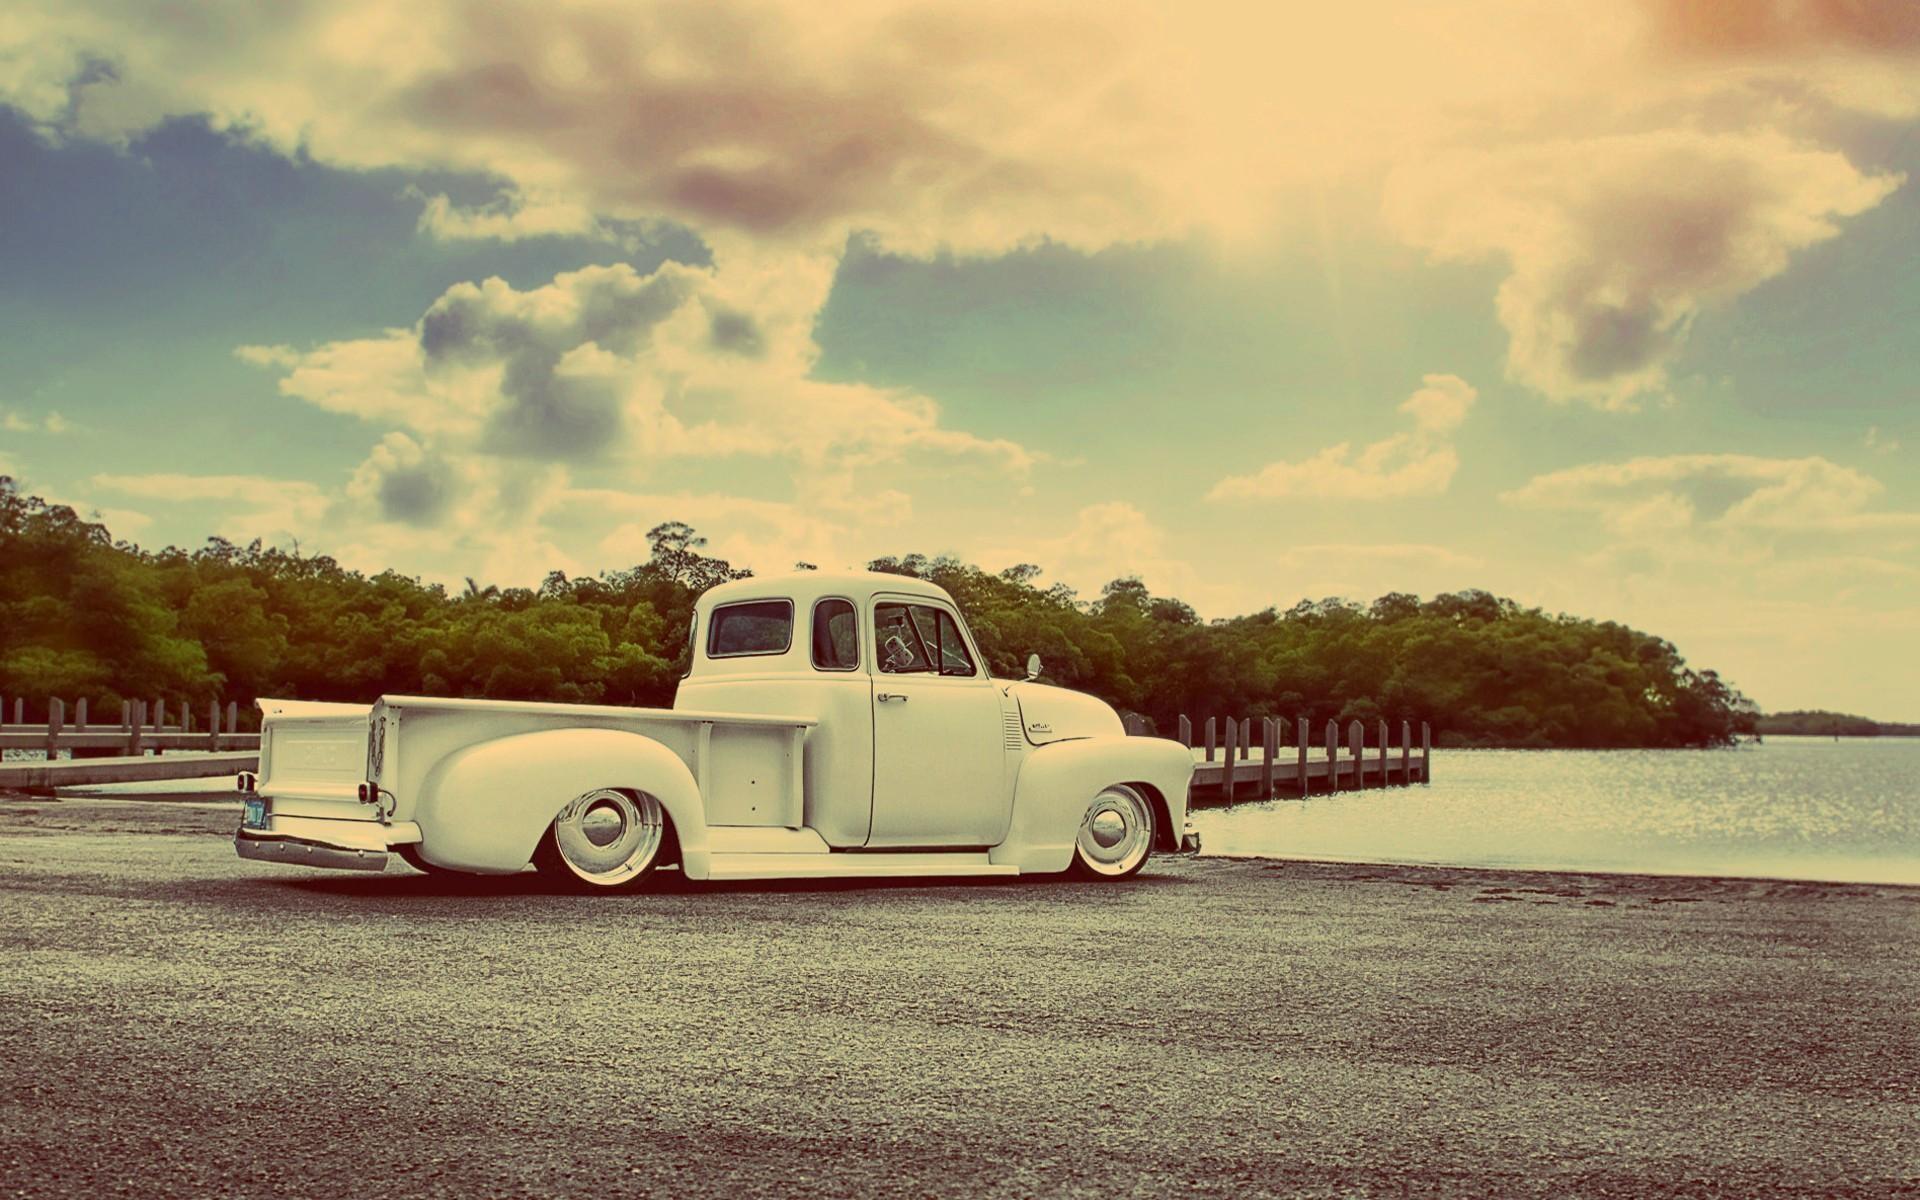 wallpaper.wiki-Semi-Truck-Desktop-Images-PIC-WPE004045